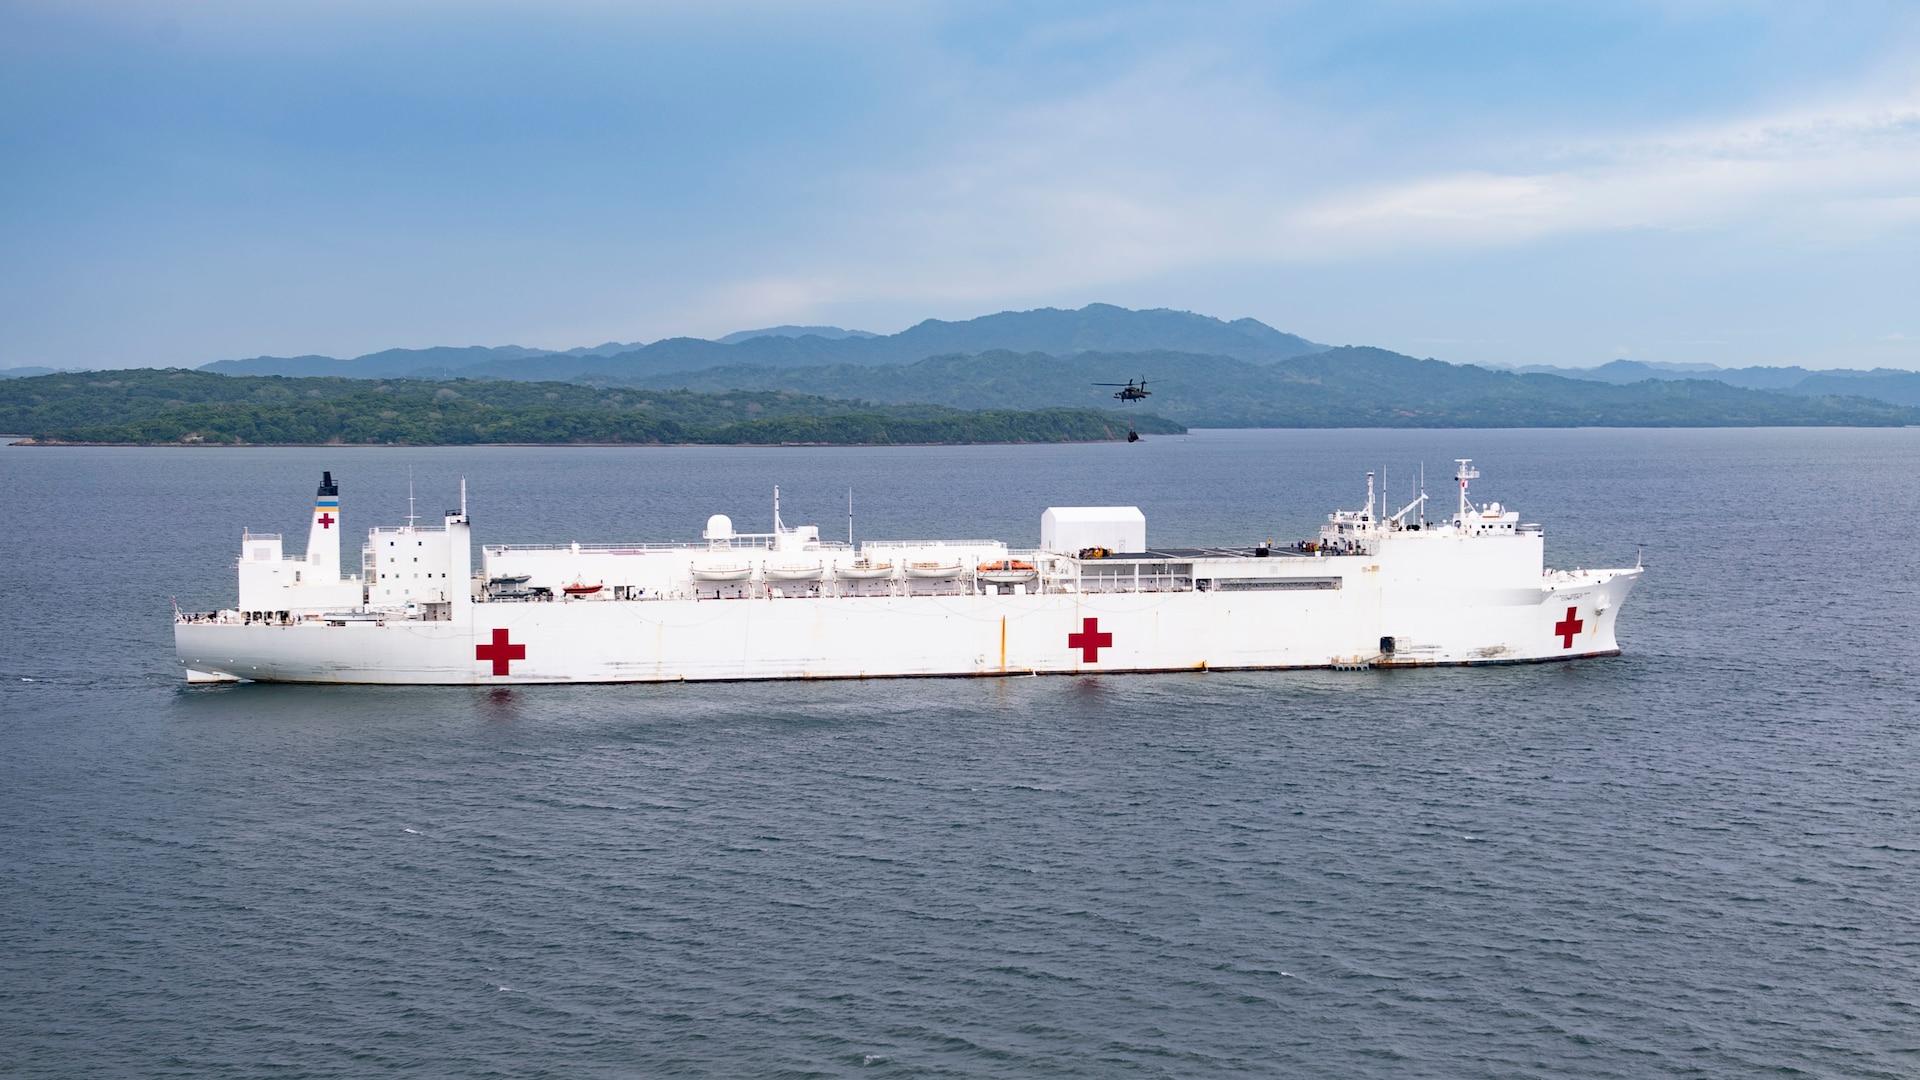 USNS Comfort off the coast of Costa Rica